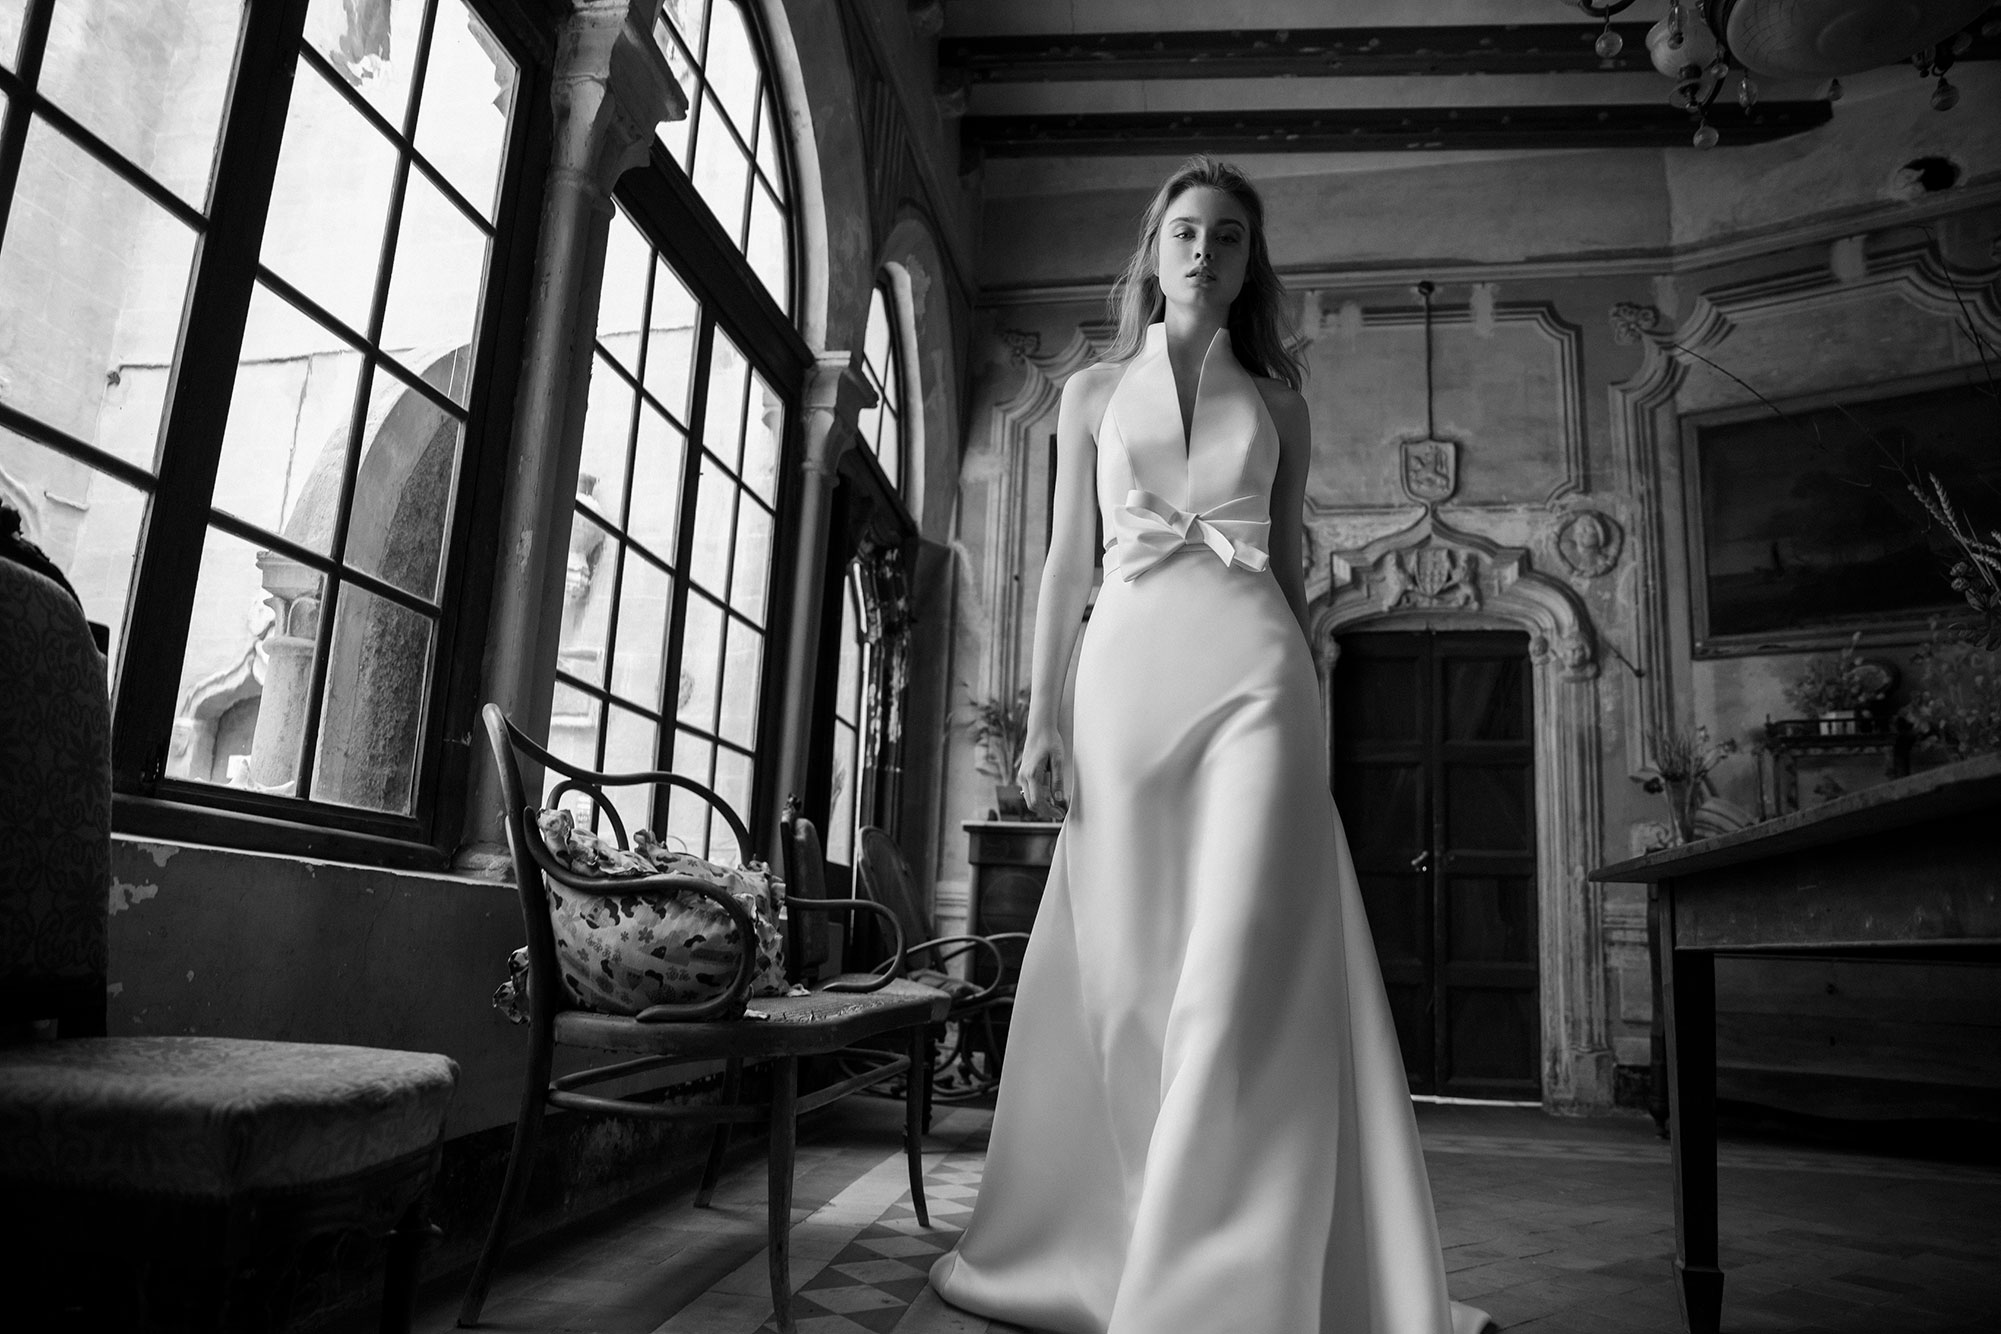 jesus peiro 2018 collection dress